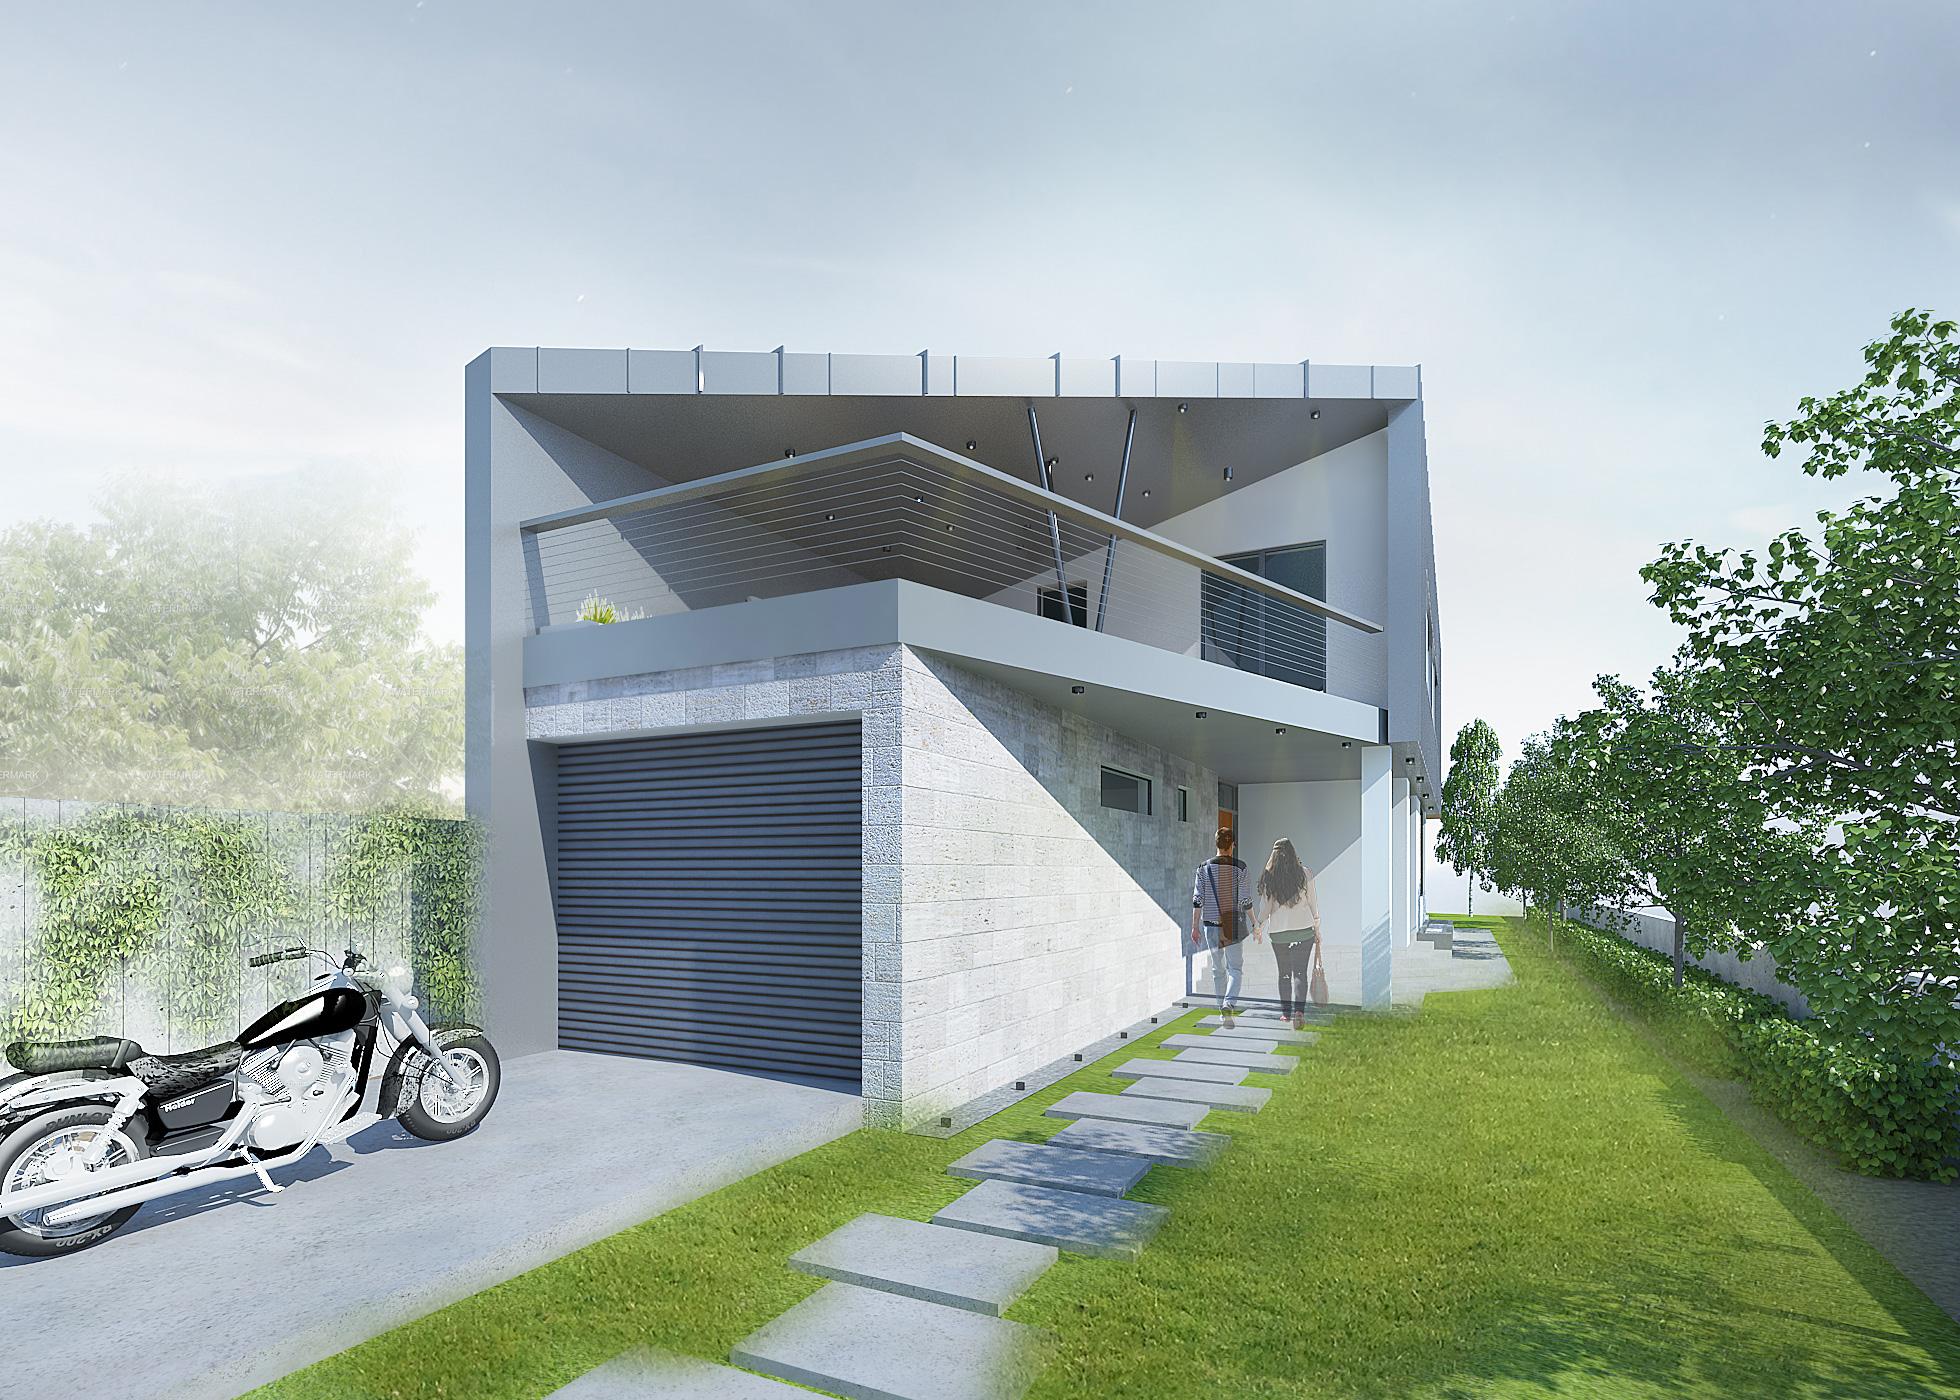 casa-motociclist-01